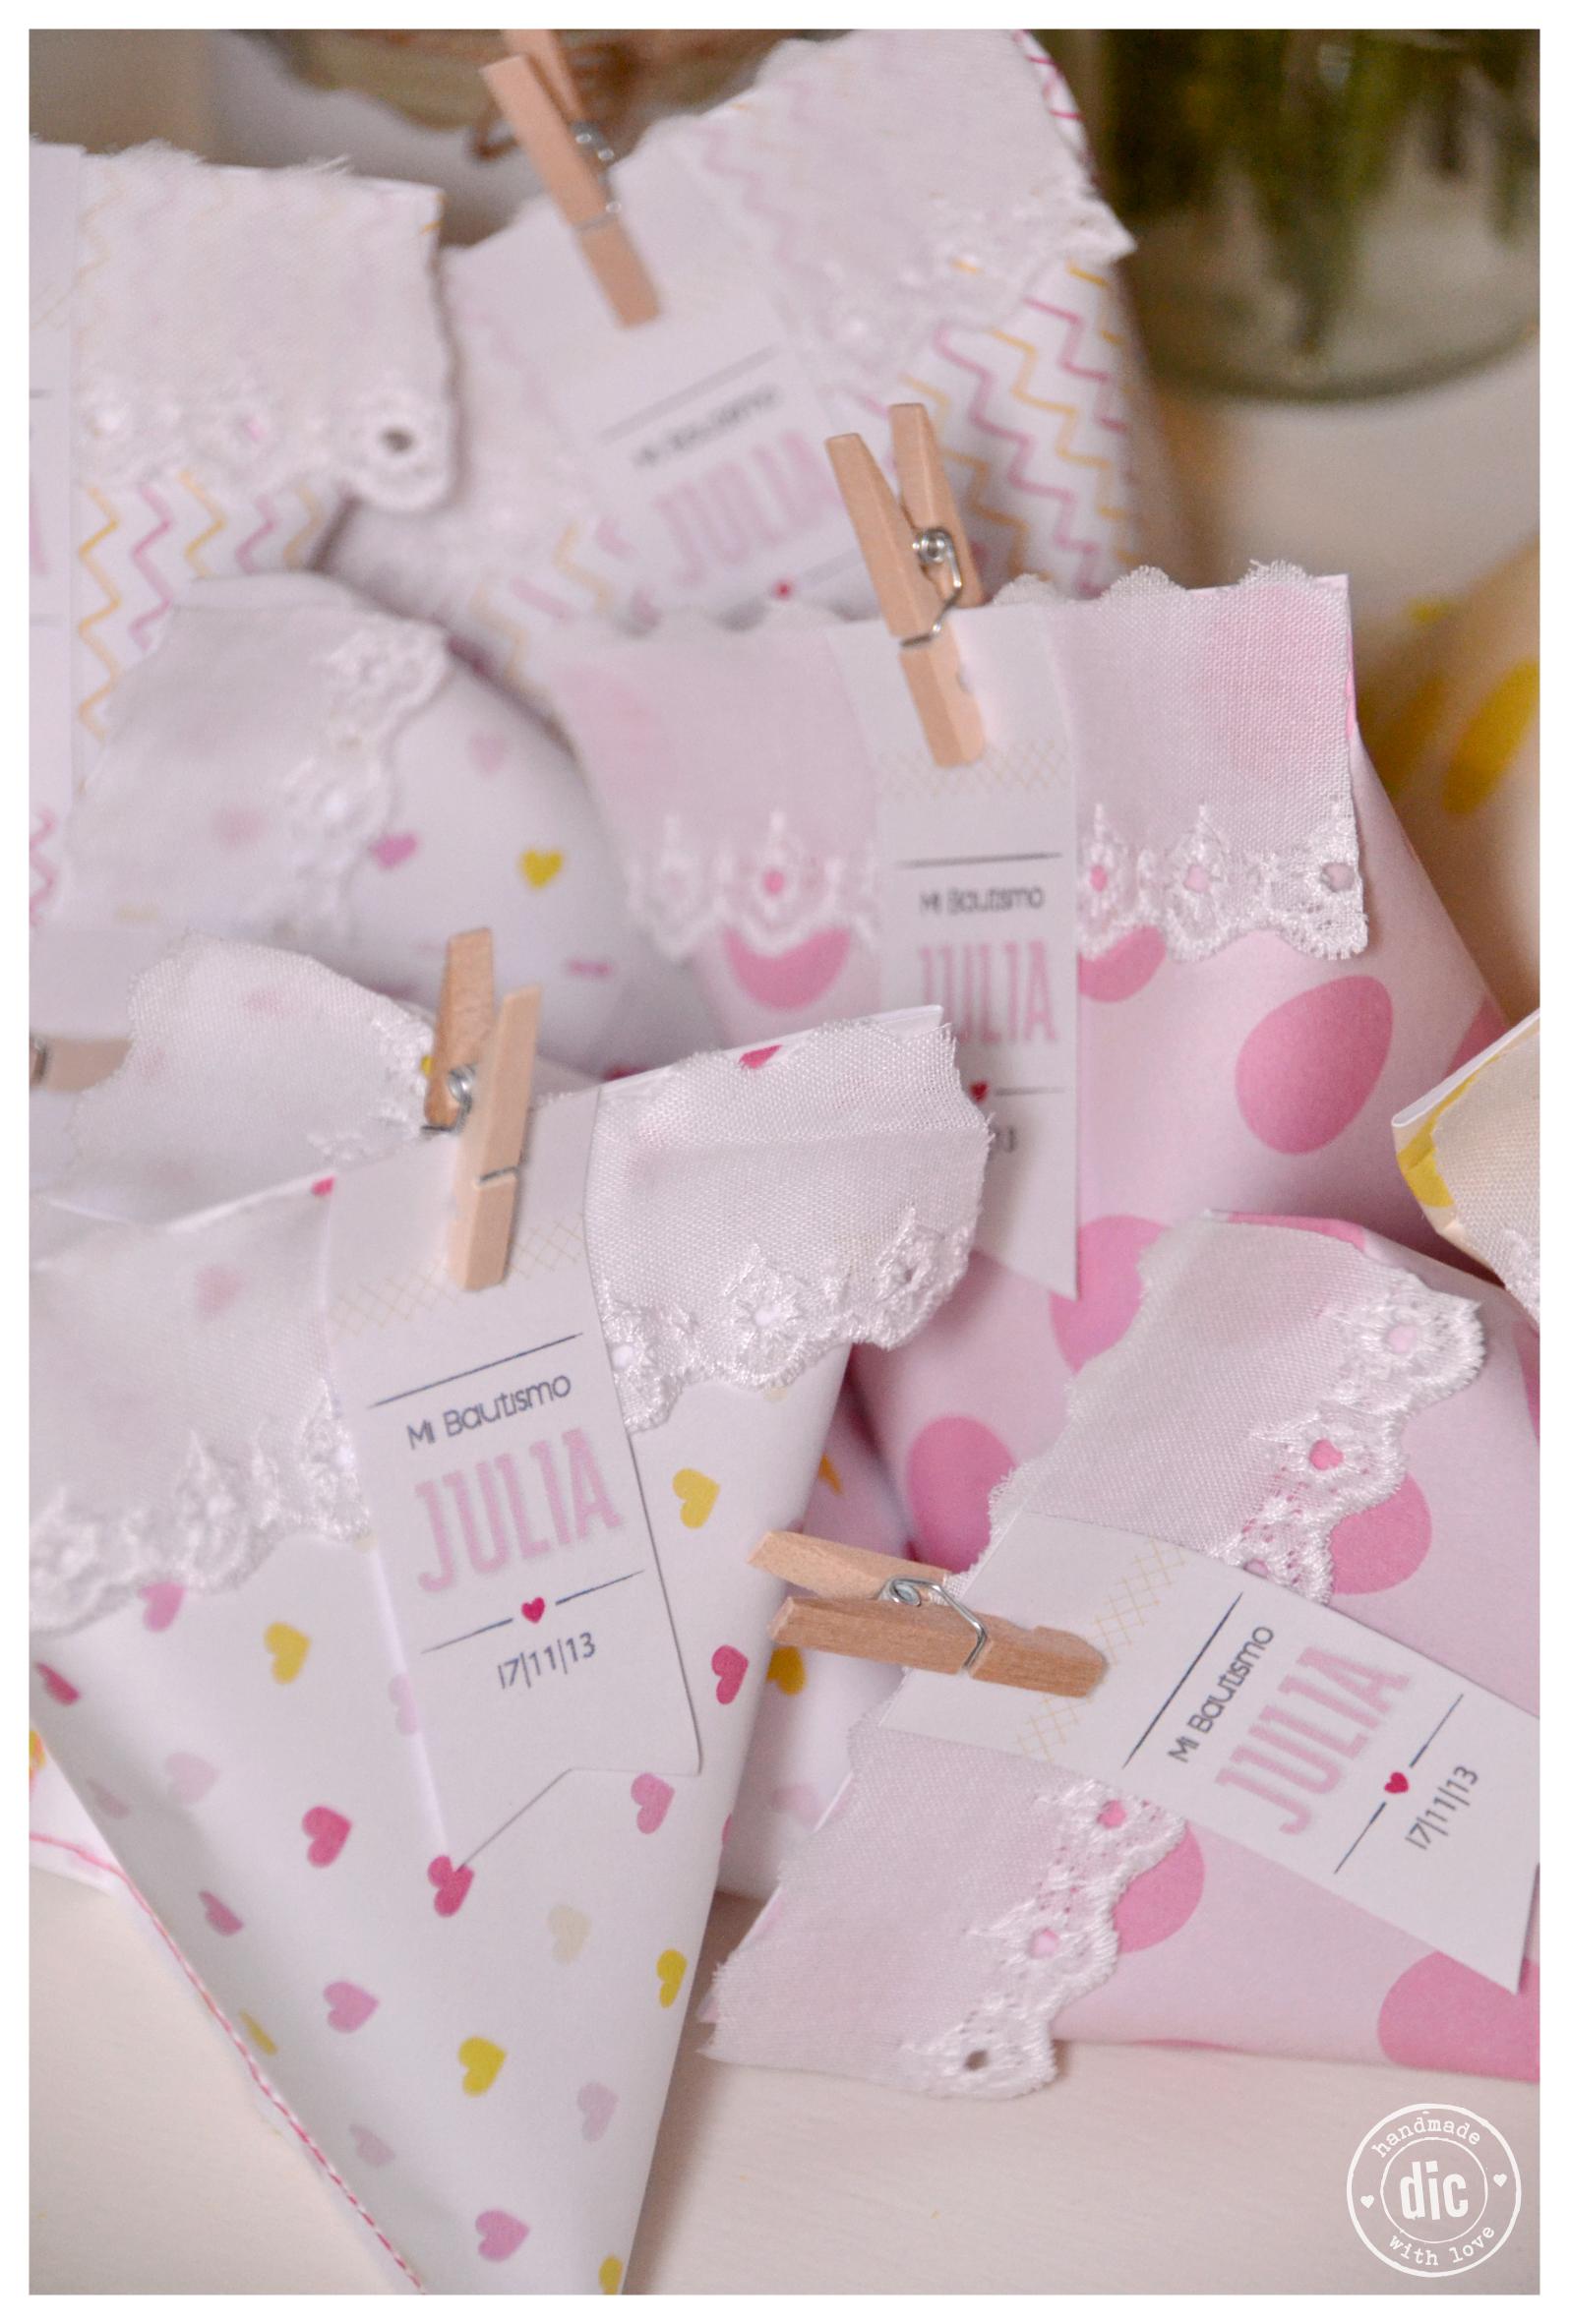 Souvenirs para adultos  nios Pack de papel